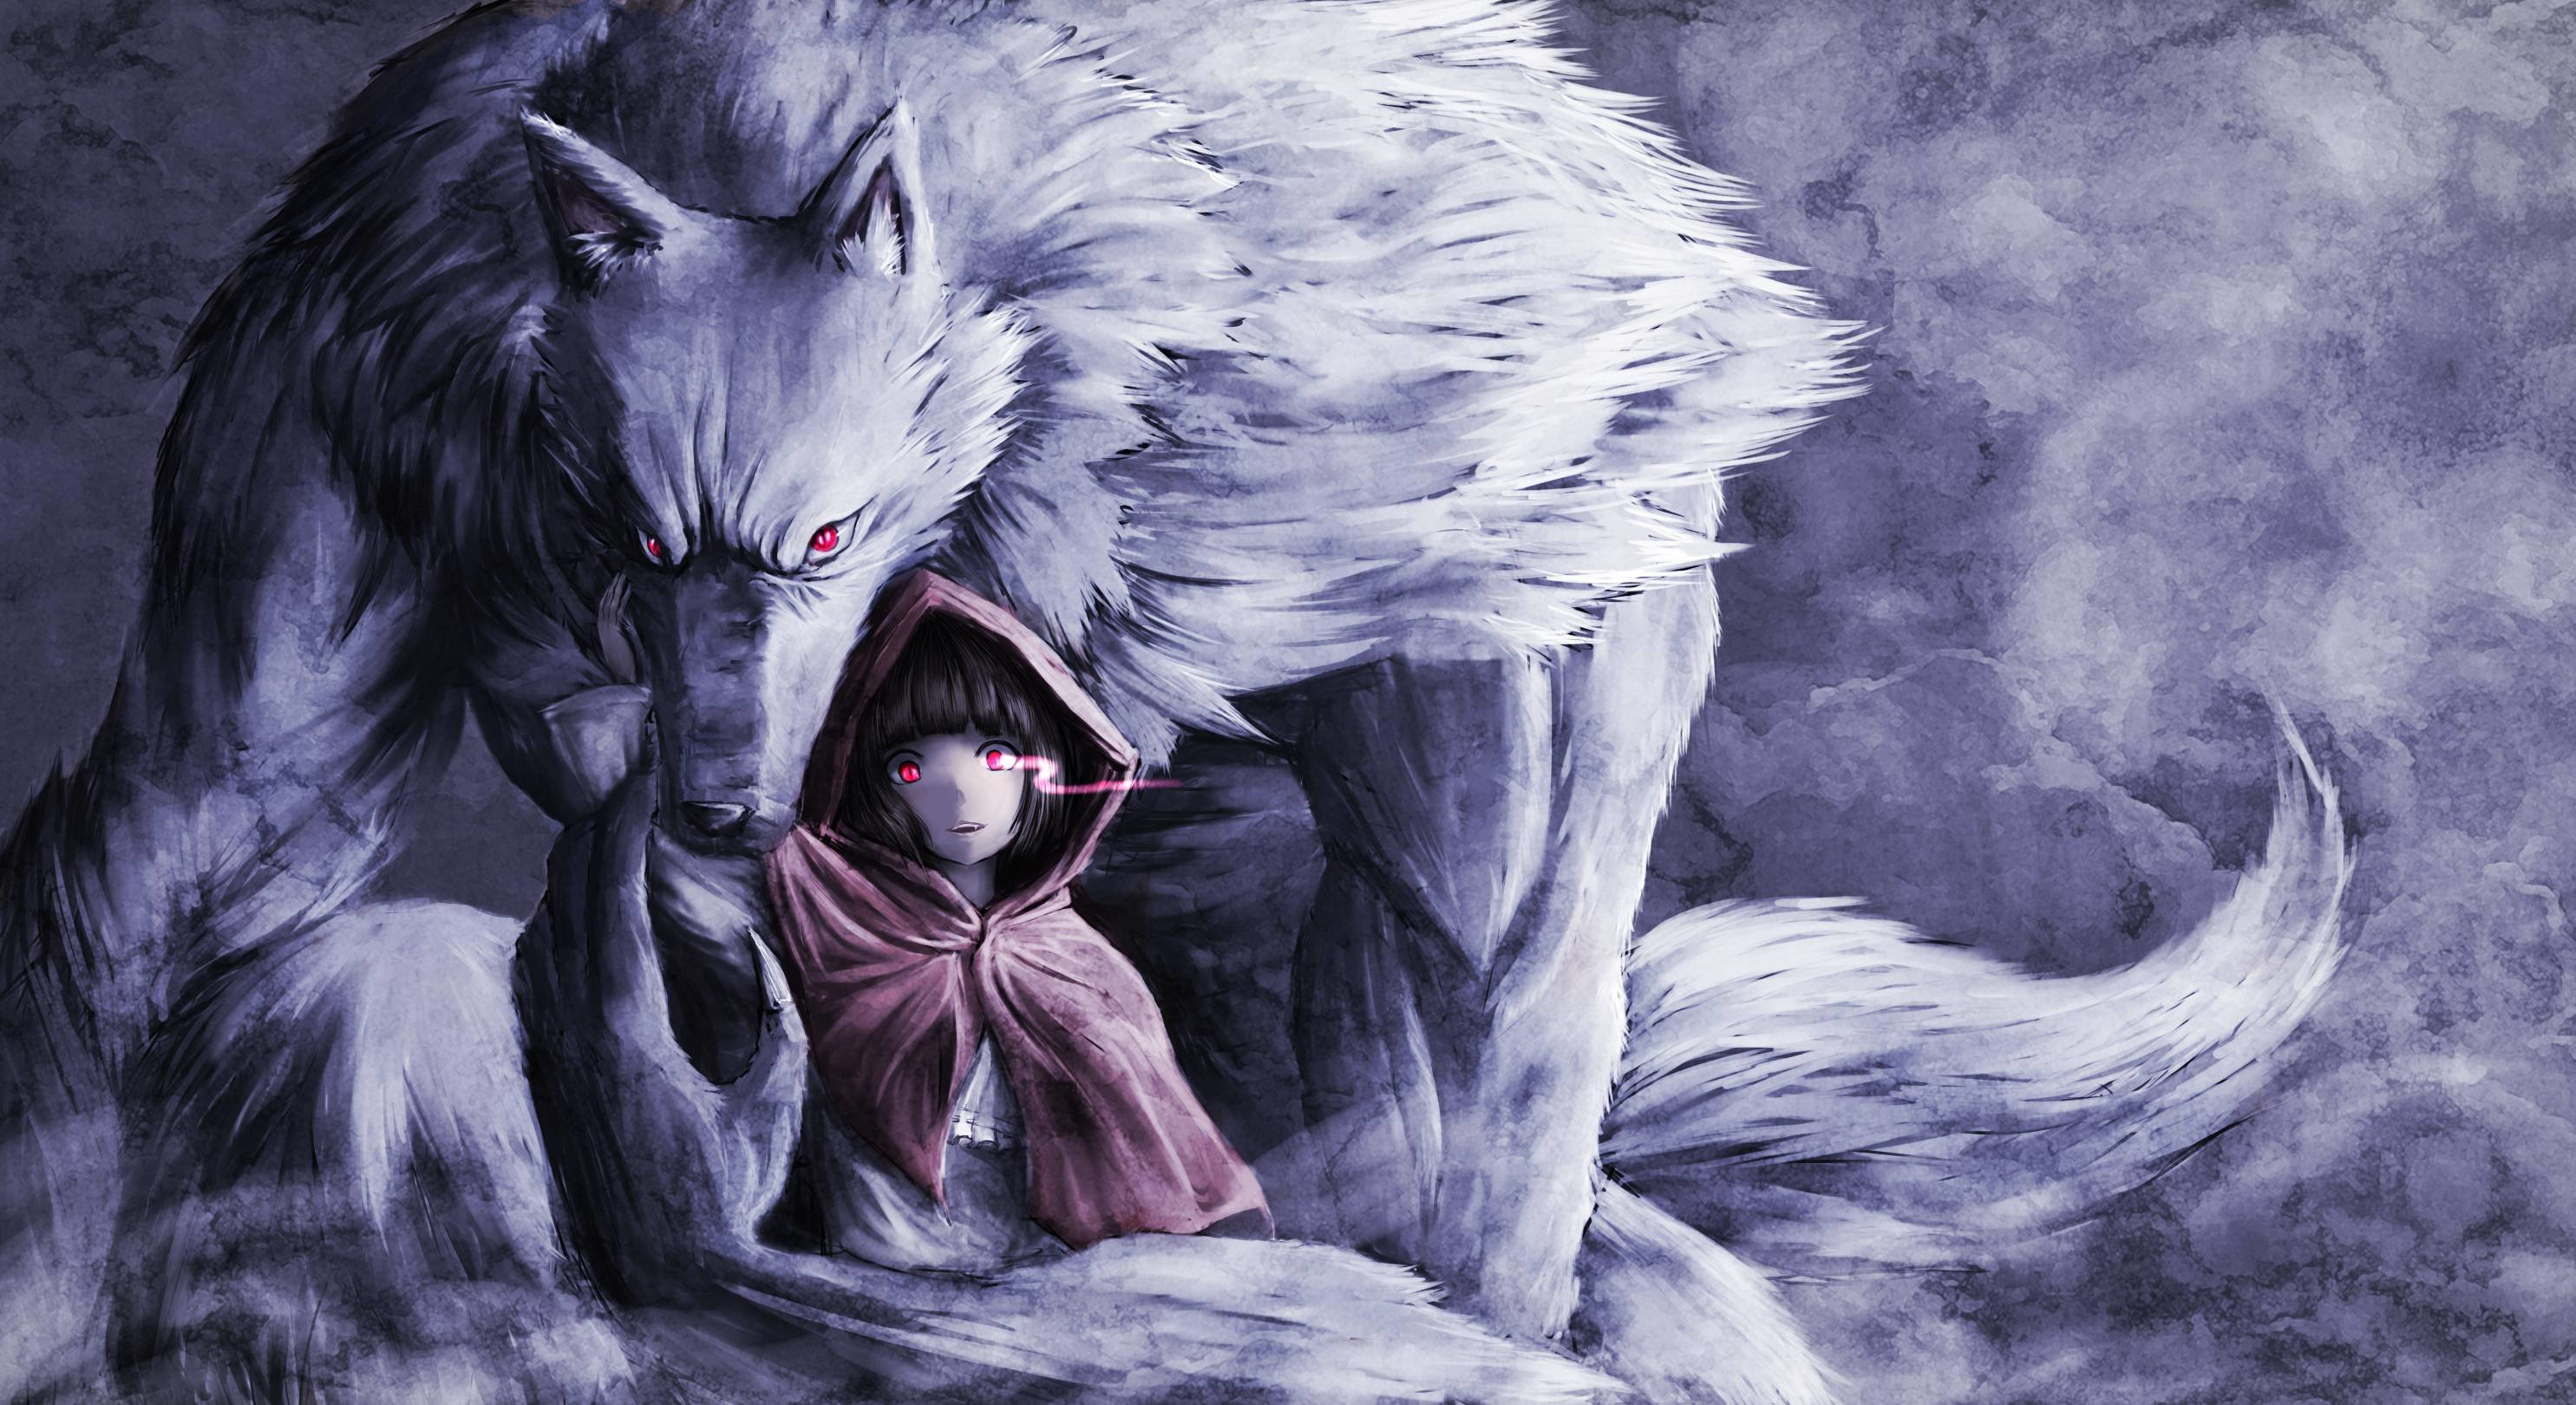 Фото татуировок волк воющий на луну